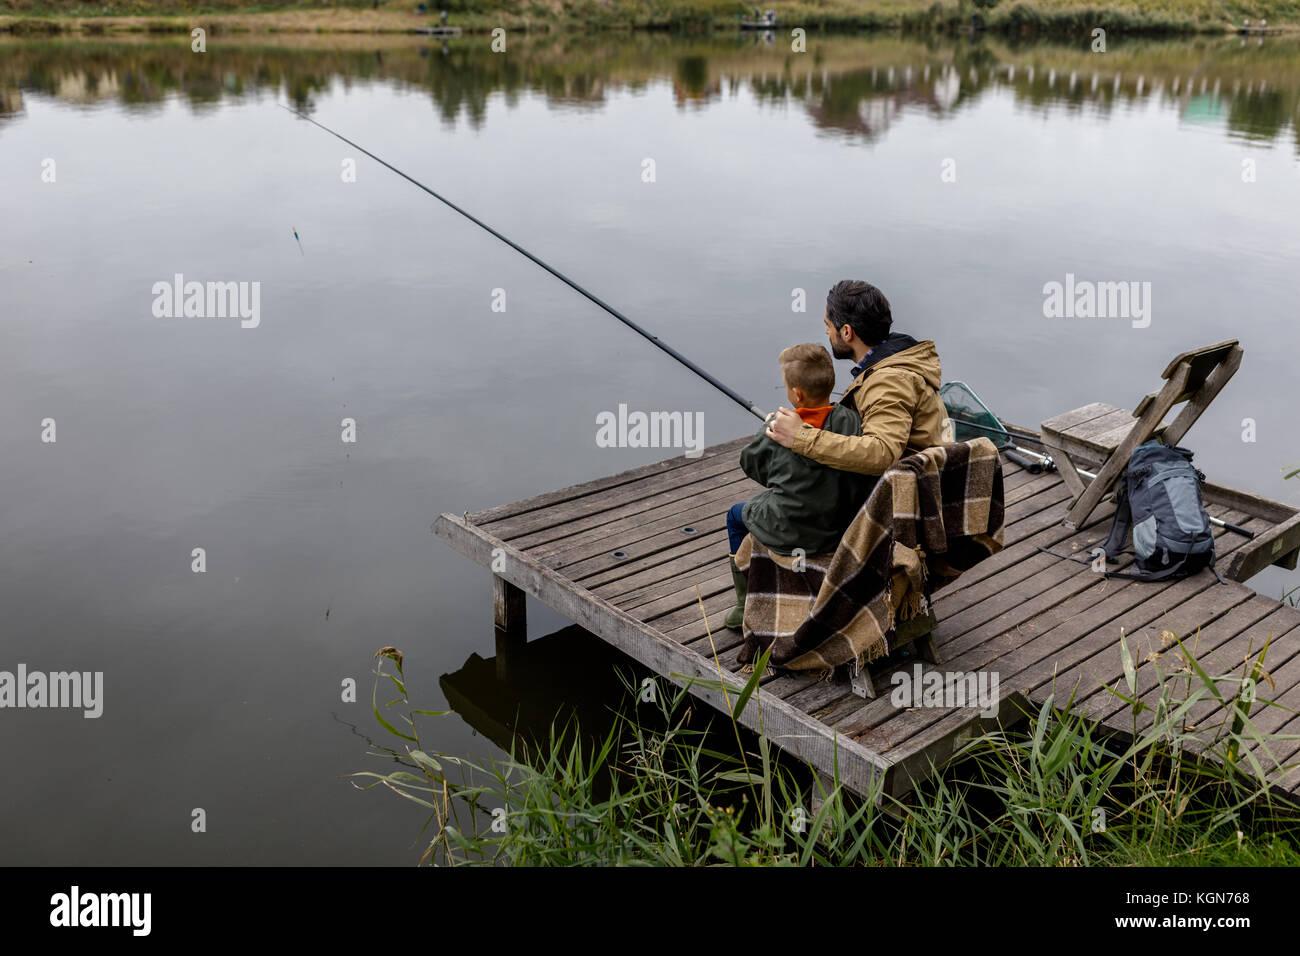 Vater und Sohn Angeln am Pier Stockbild